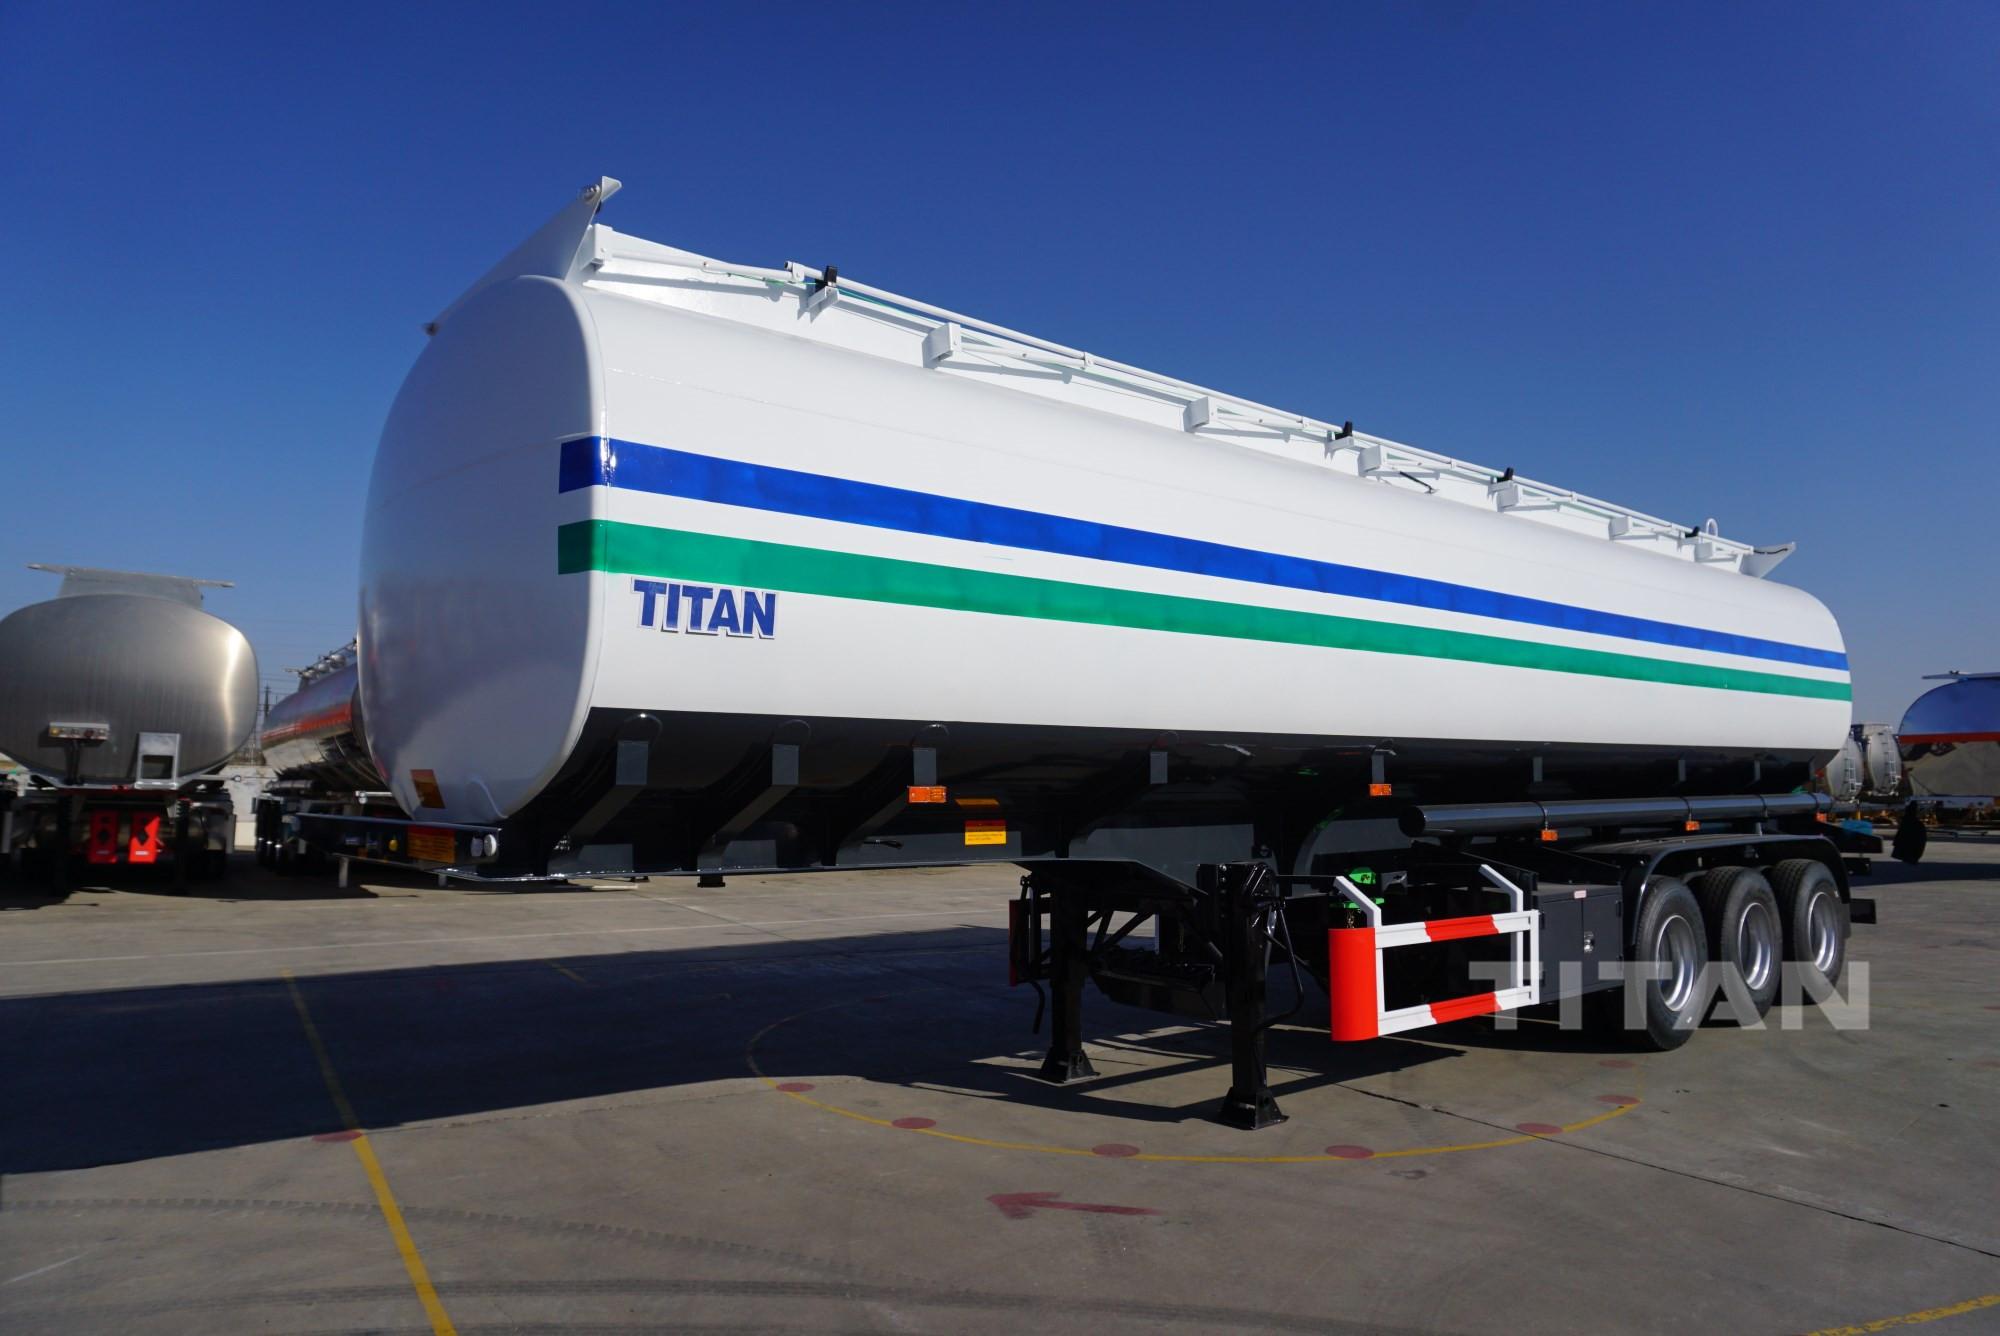 36cbm 2 Axl Tri-axle 6 Cabin 40cbm 45cbm 47cbm 60cbm 50cbm Crude Oil Trucks  Tanker Manufacture 42cbm Fuel Trailer Tank - Buy Fuel Tanker Trailer For